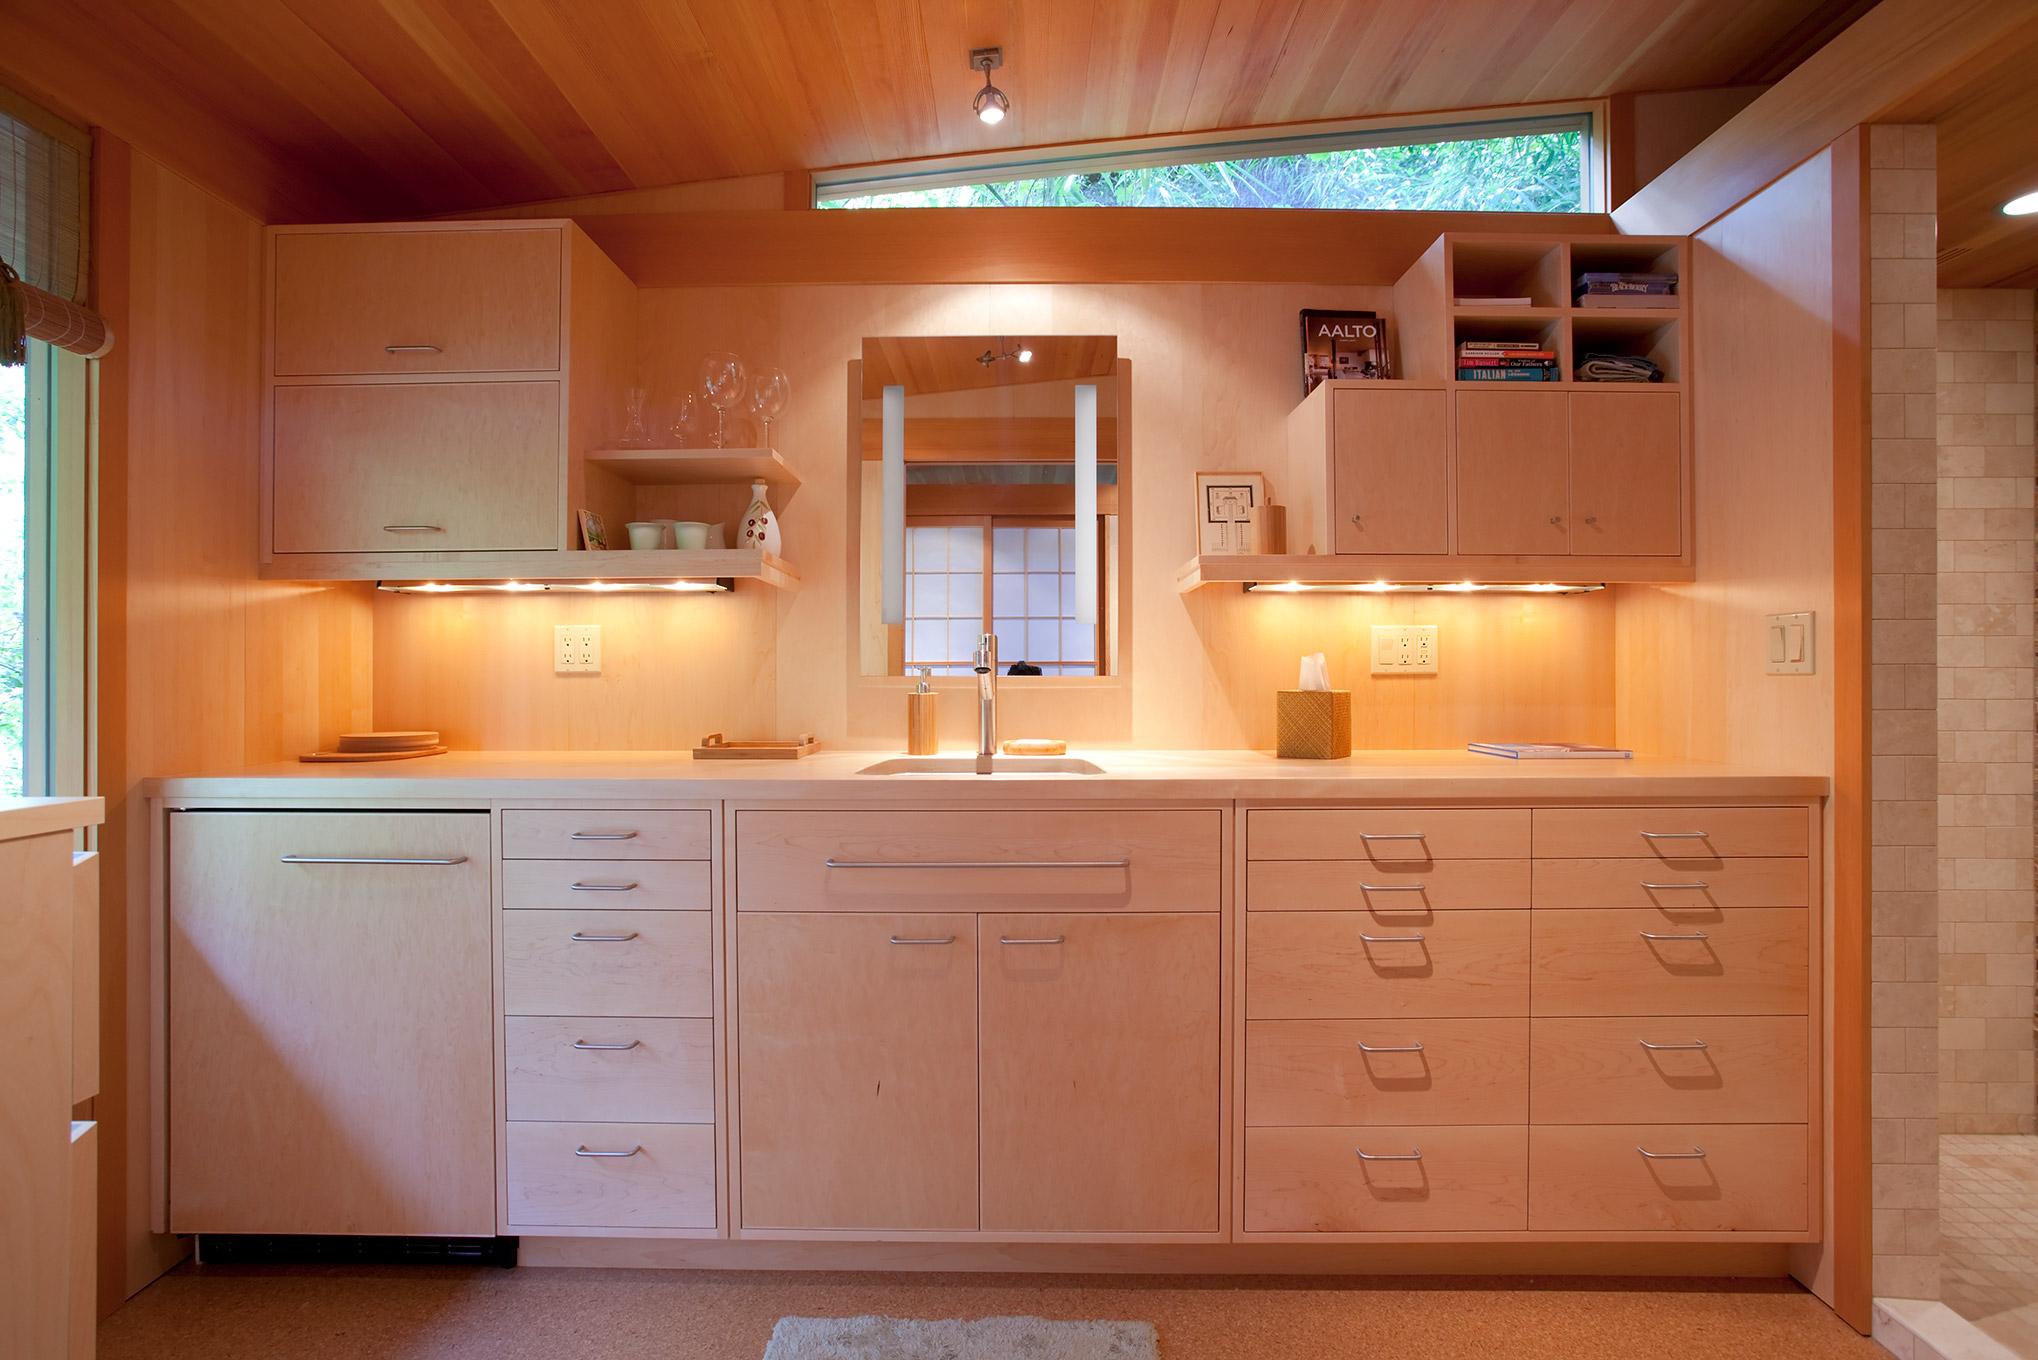 Belluschi teahouse kitchen